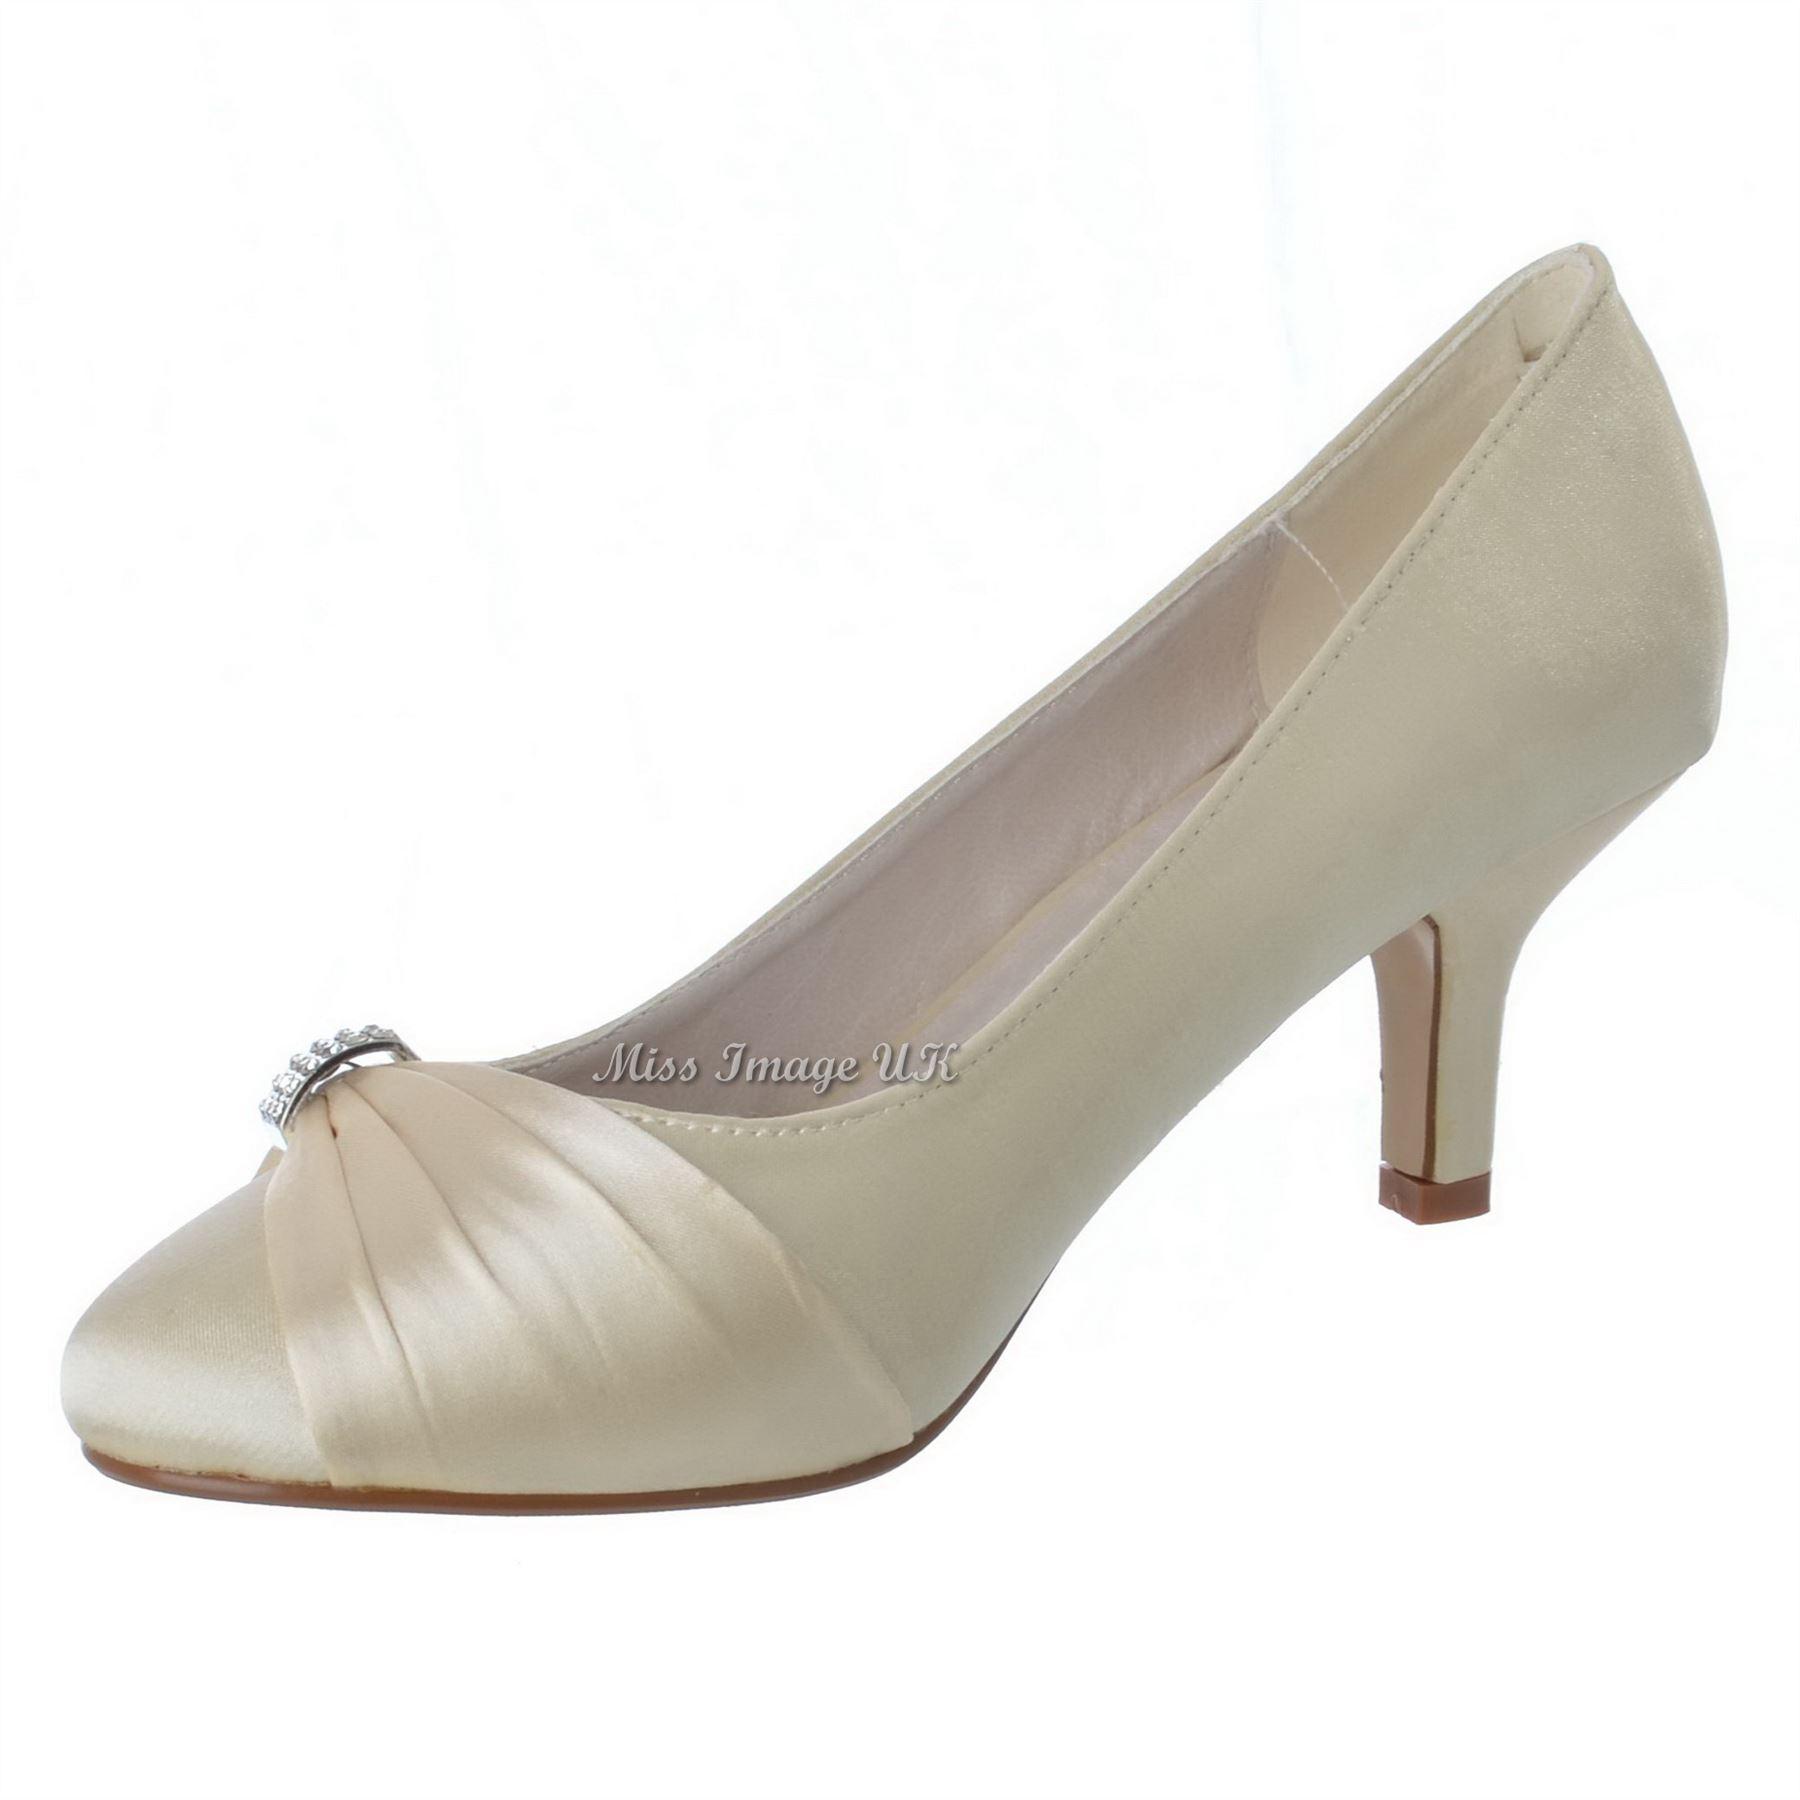 Bridal Shoes Low Heel: WOMENS LADIES CLASSIC WEDDING BRIDAL DIAMANTE PROM SHOES